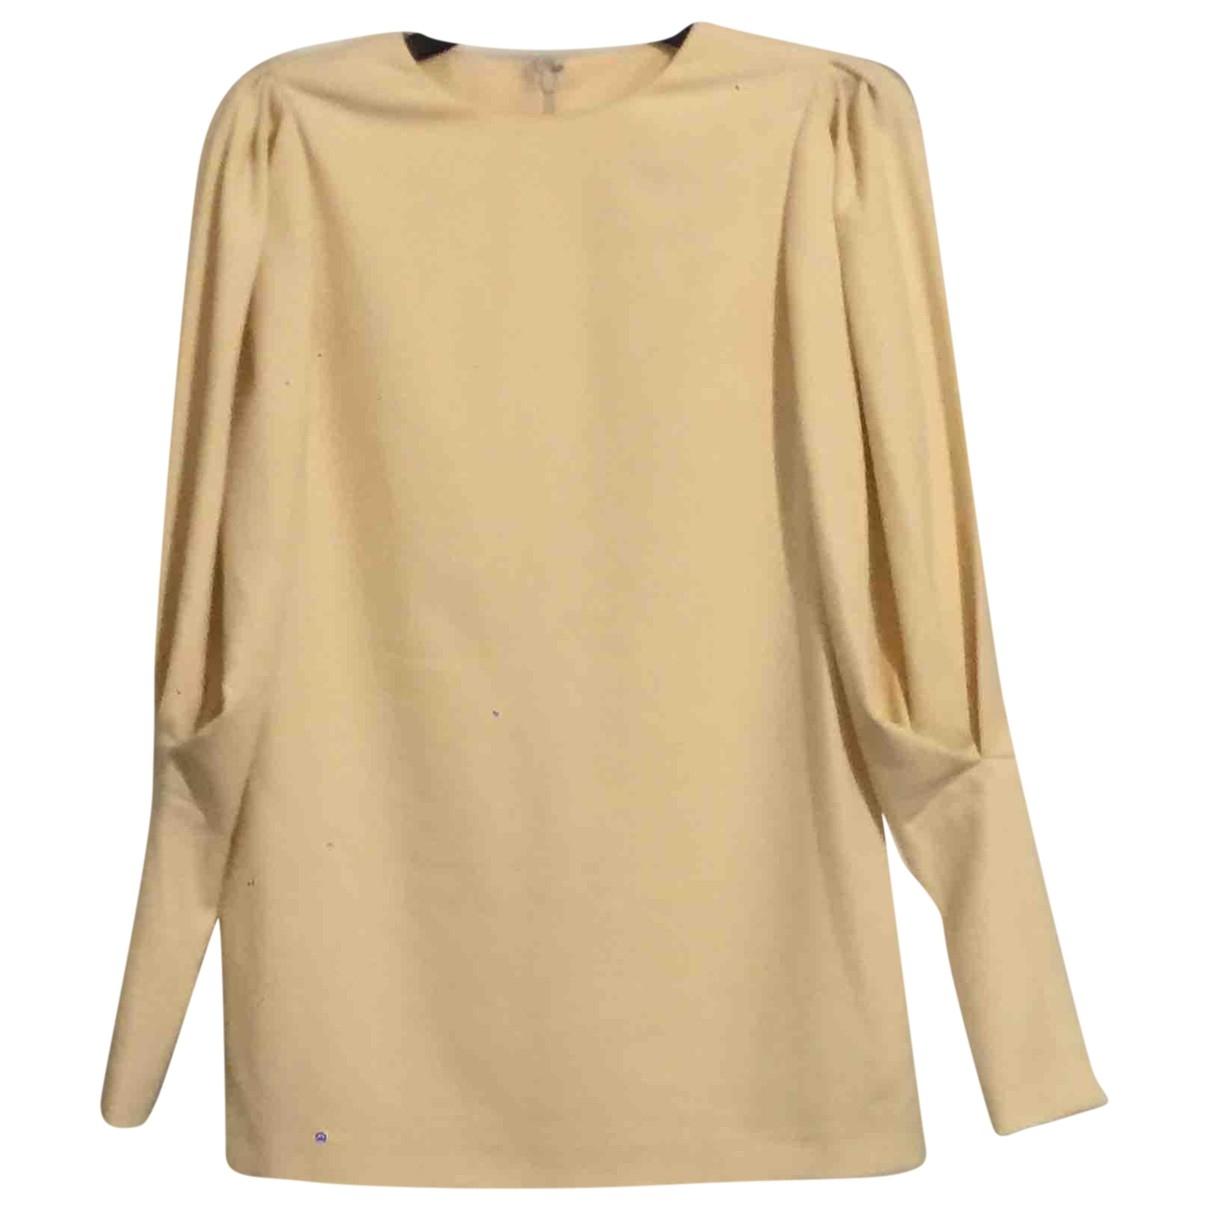 Normaluisa \N Ecru dress for Women 40 IT